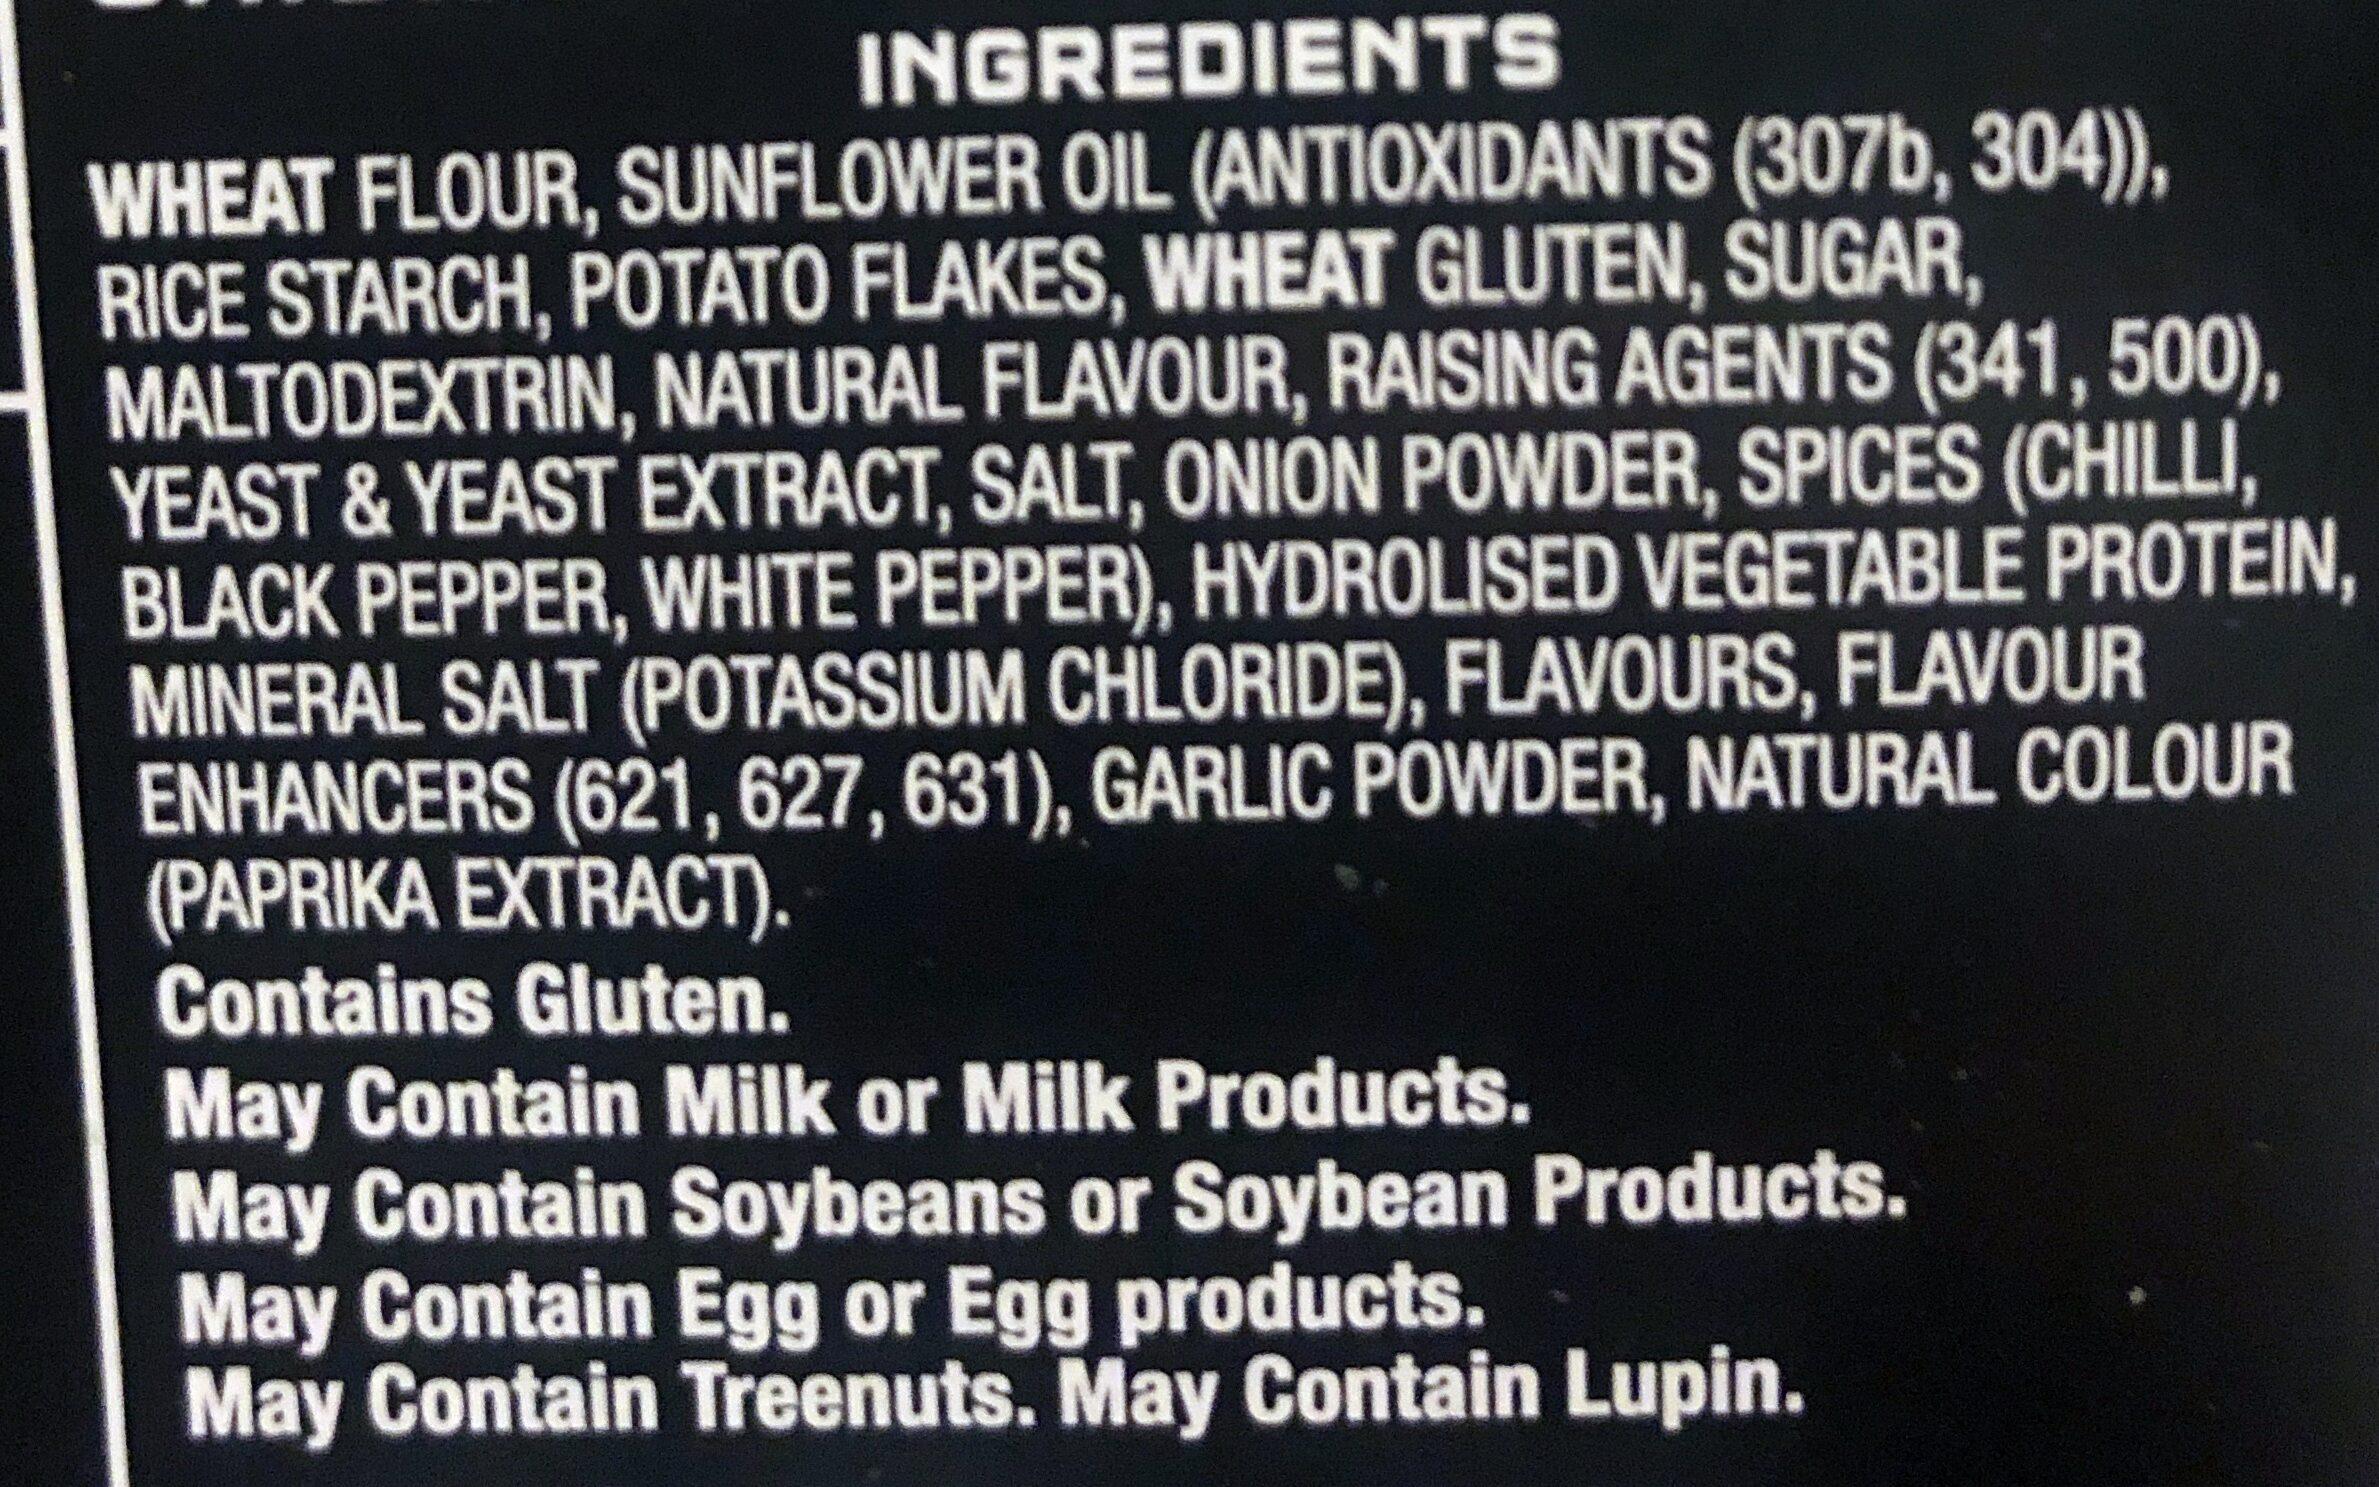 Crackers Southern Fried Chicken - Ingredients - en